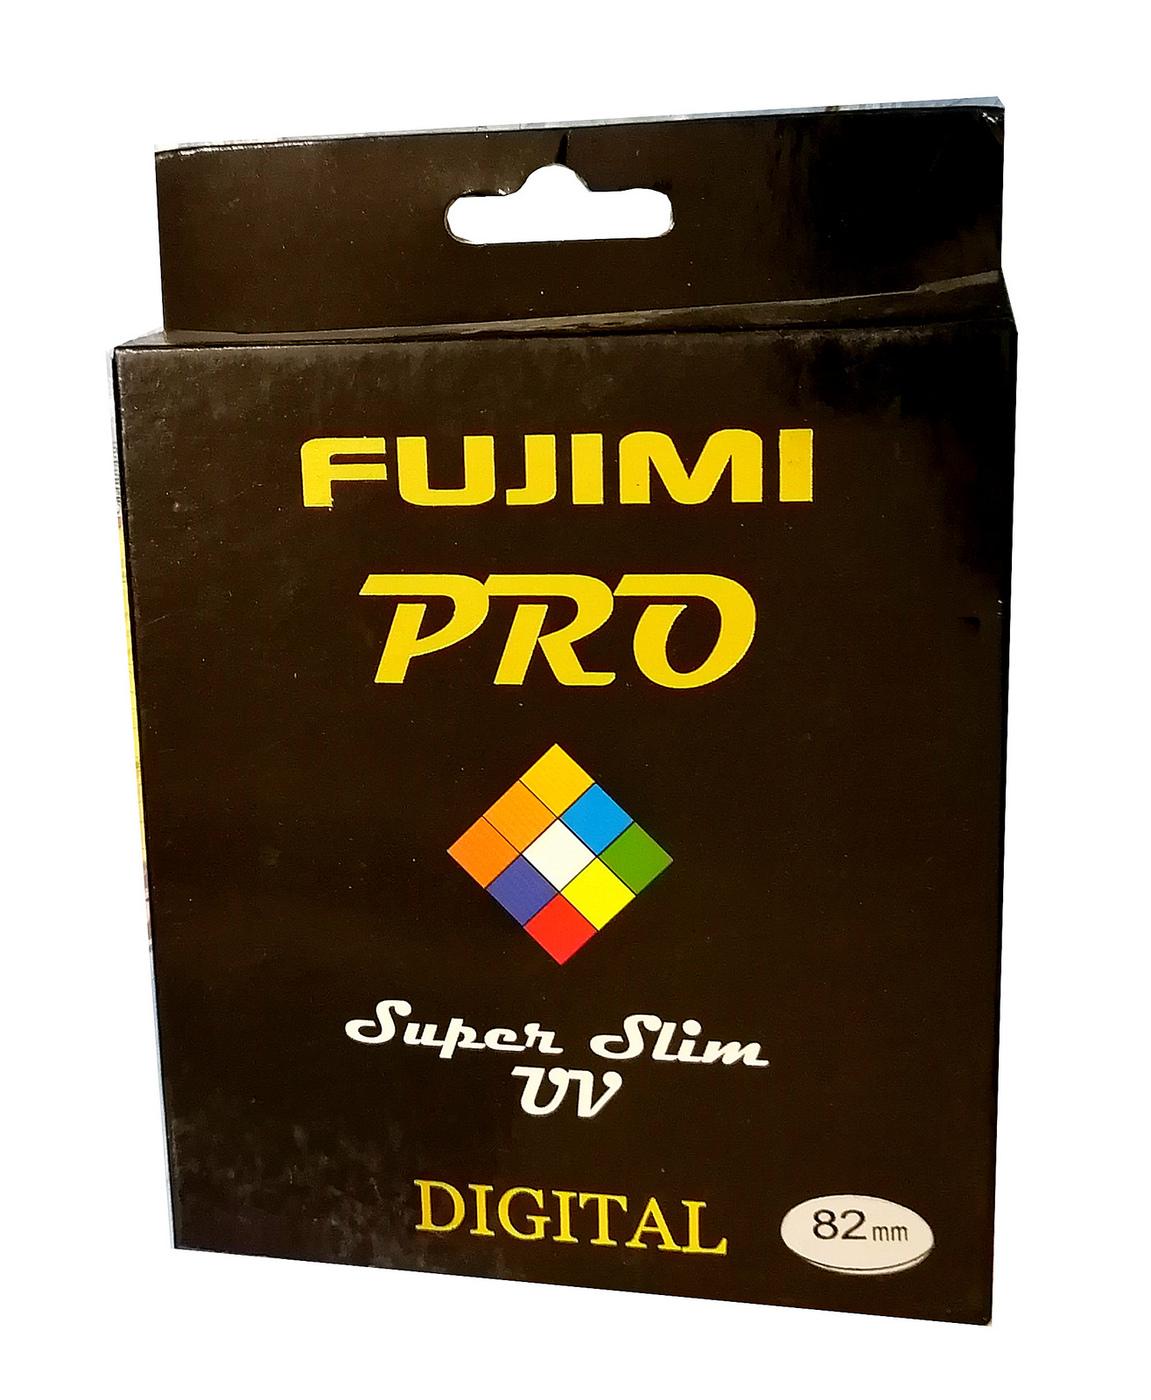 Светофильтр Fujimi Super slim UV 82мм